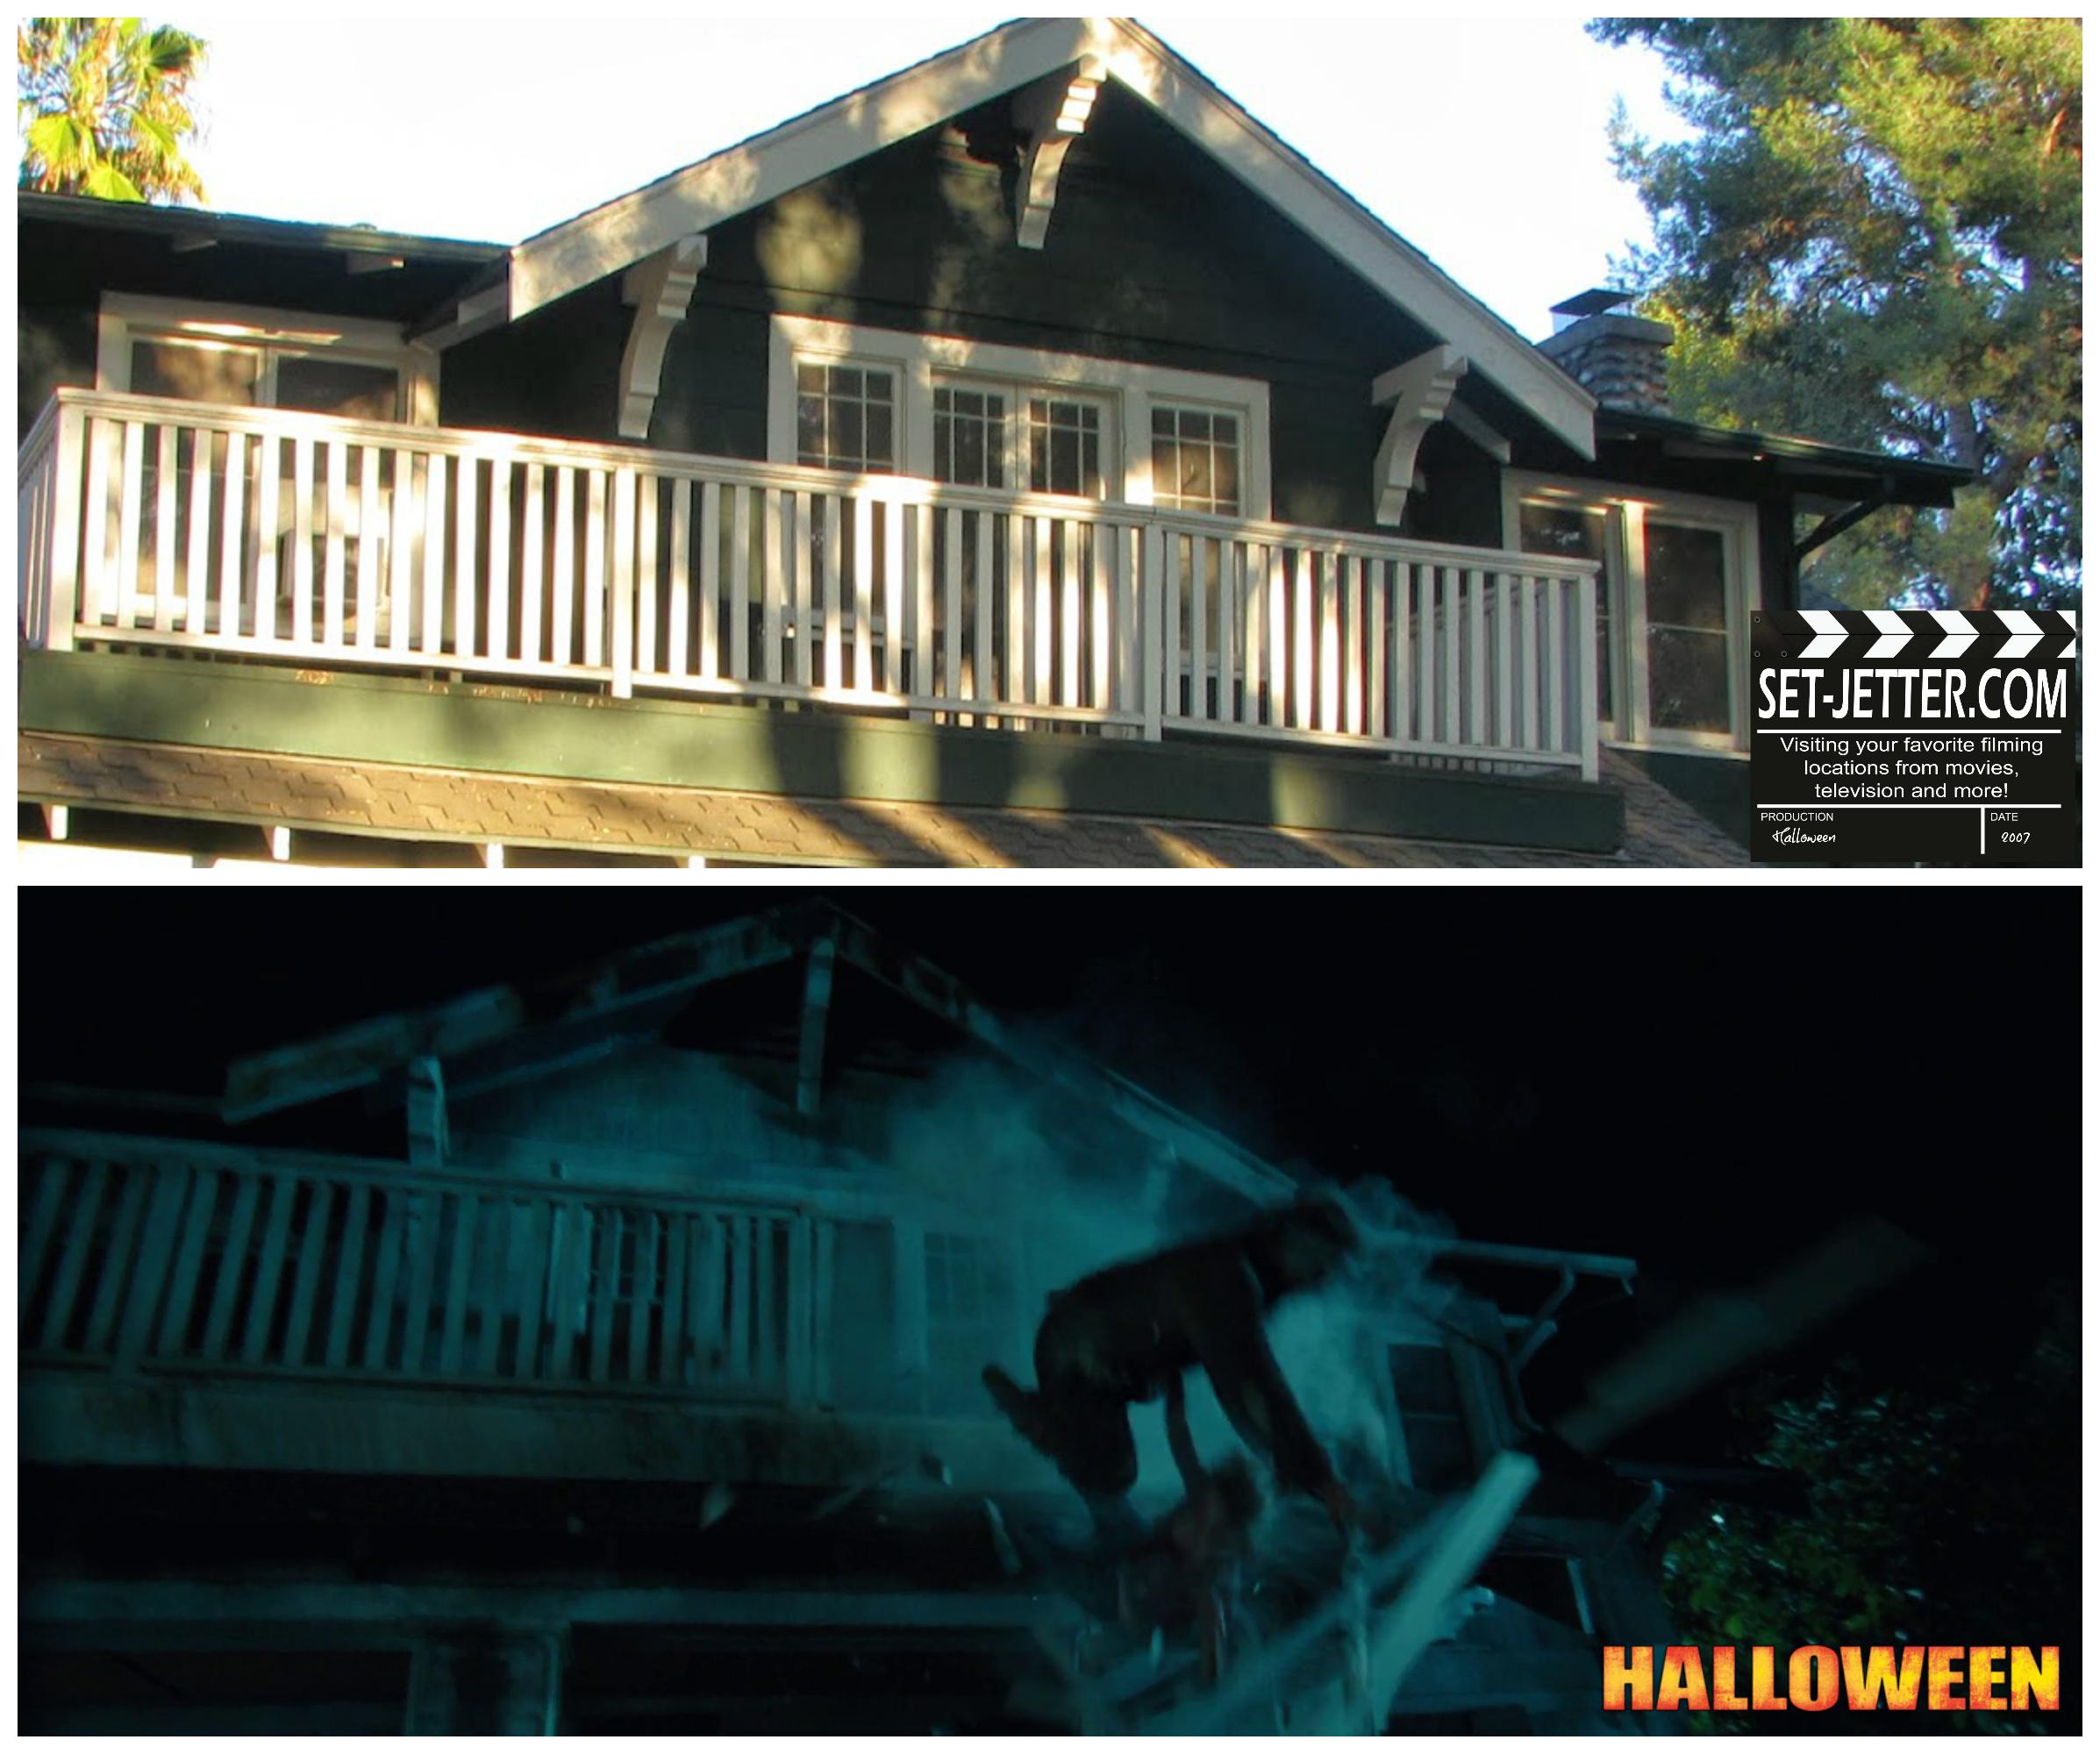 Halloween 2007 comparison 20.jpg